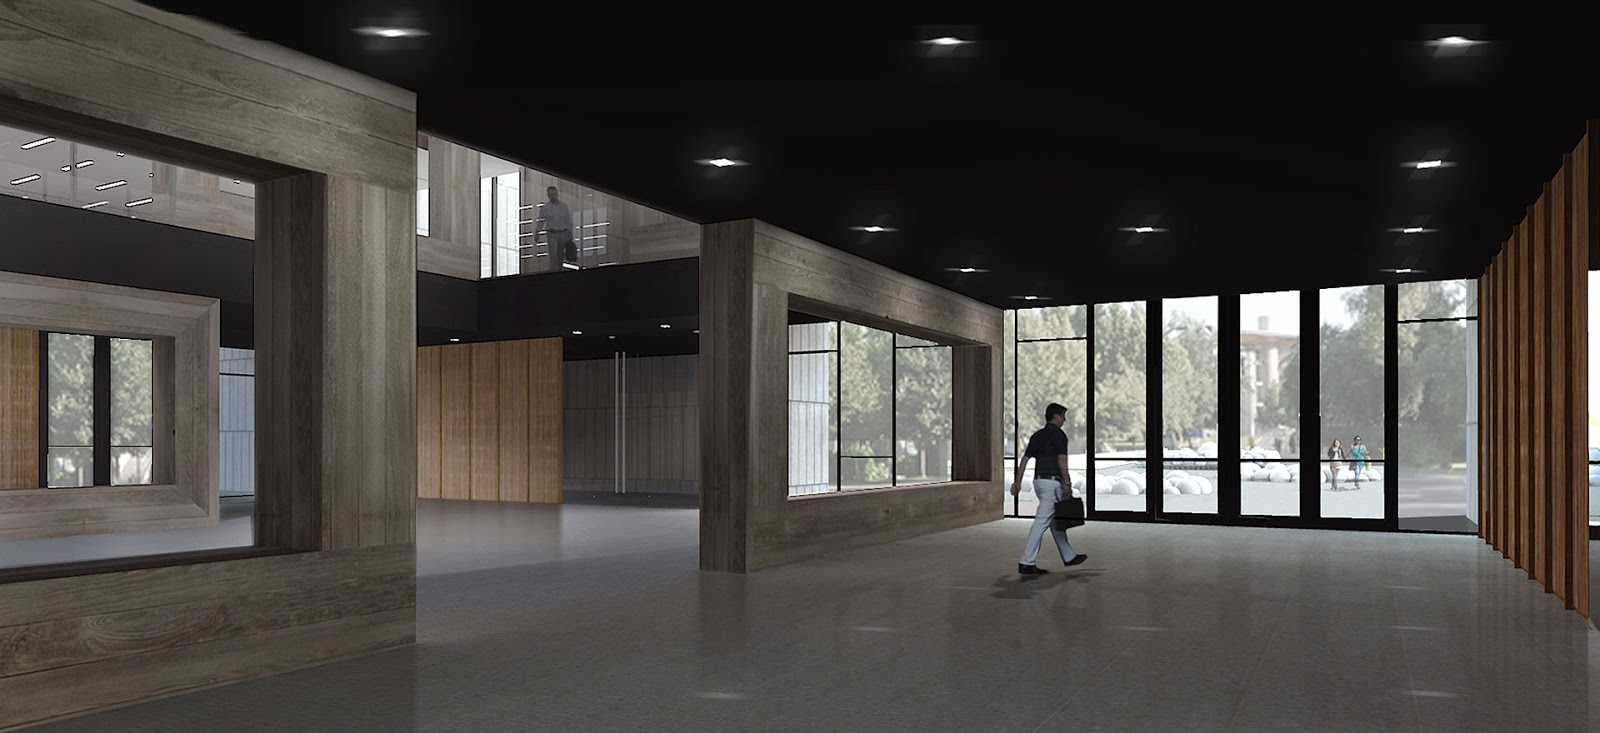 Alejandro aravena elemental a f a s i a for Arquitectura de interiores universidades